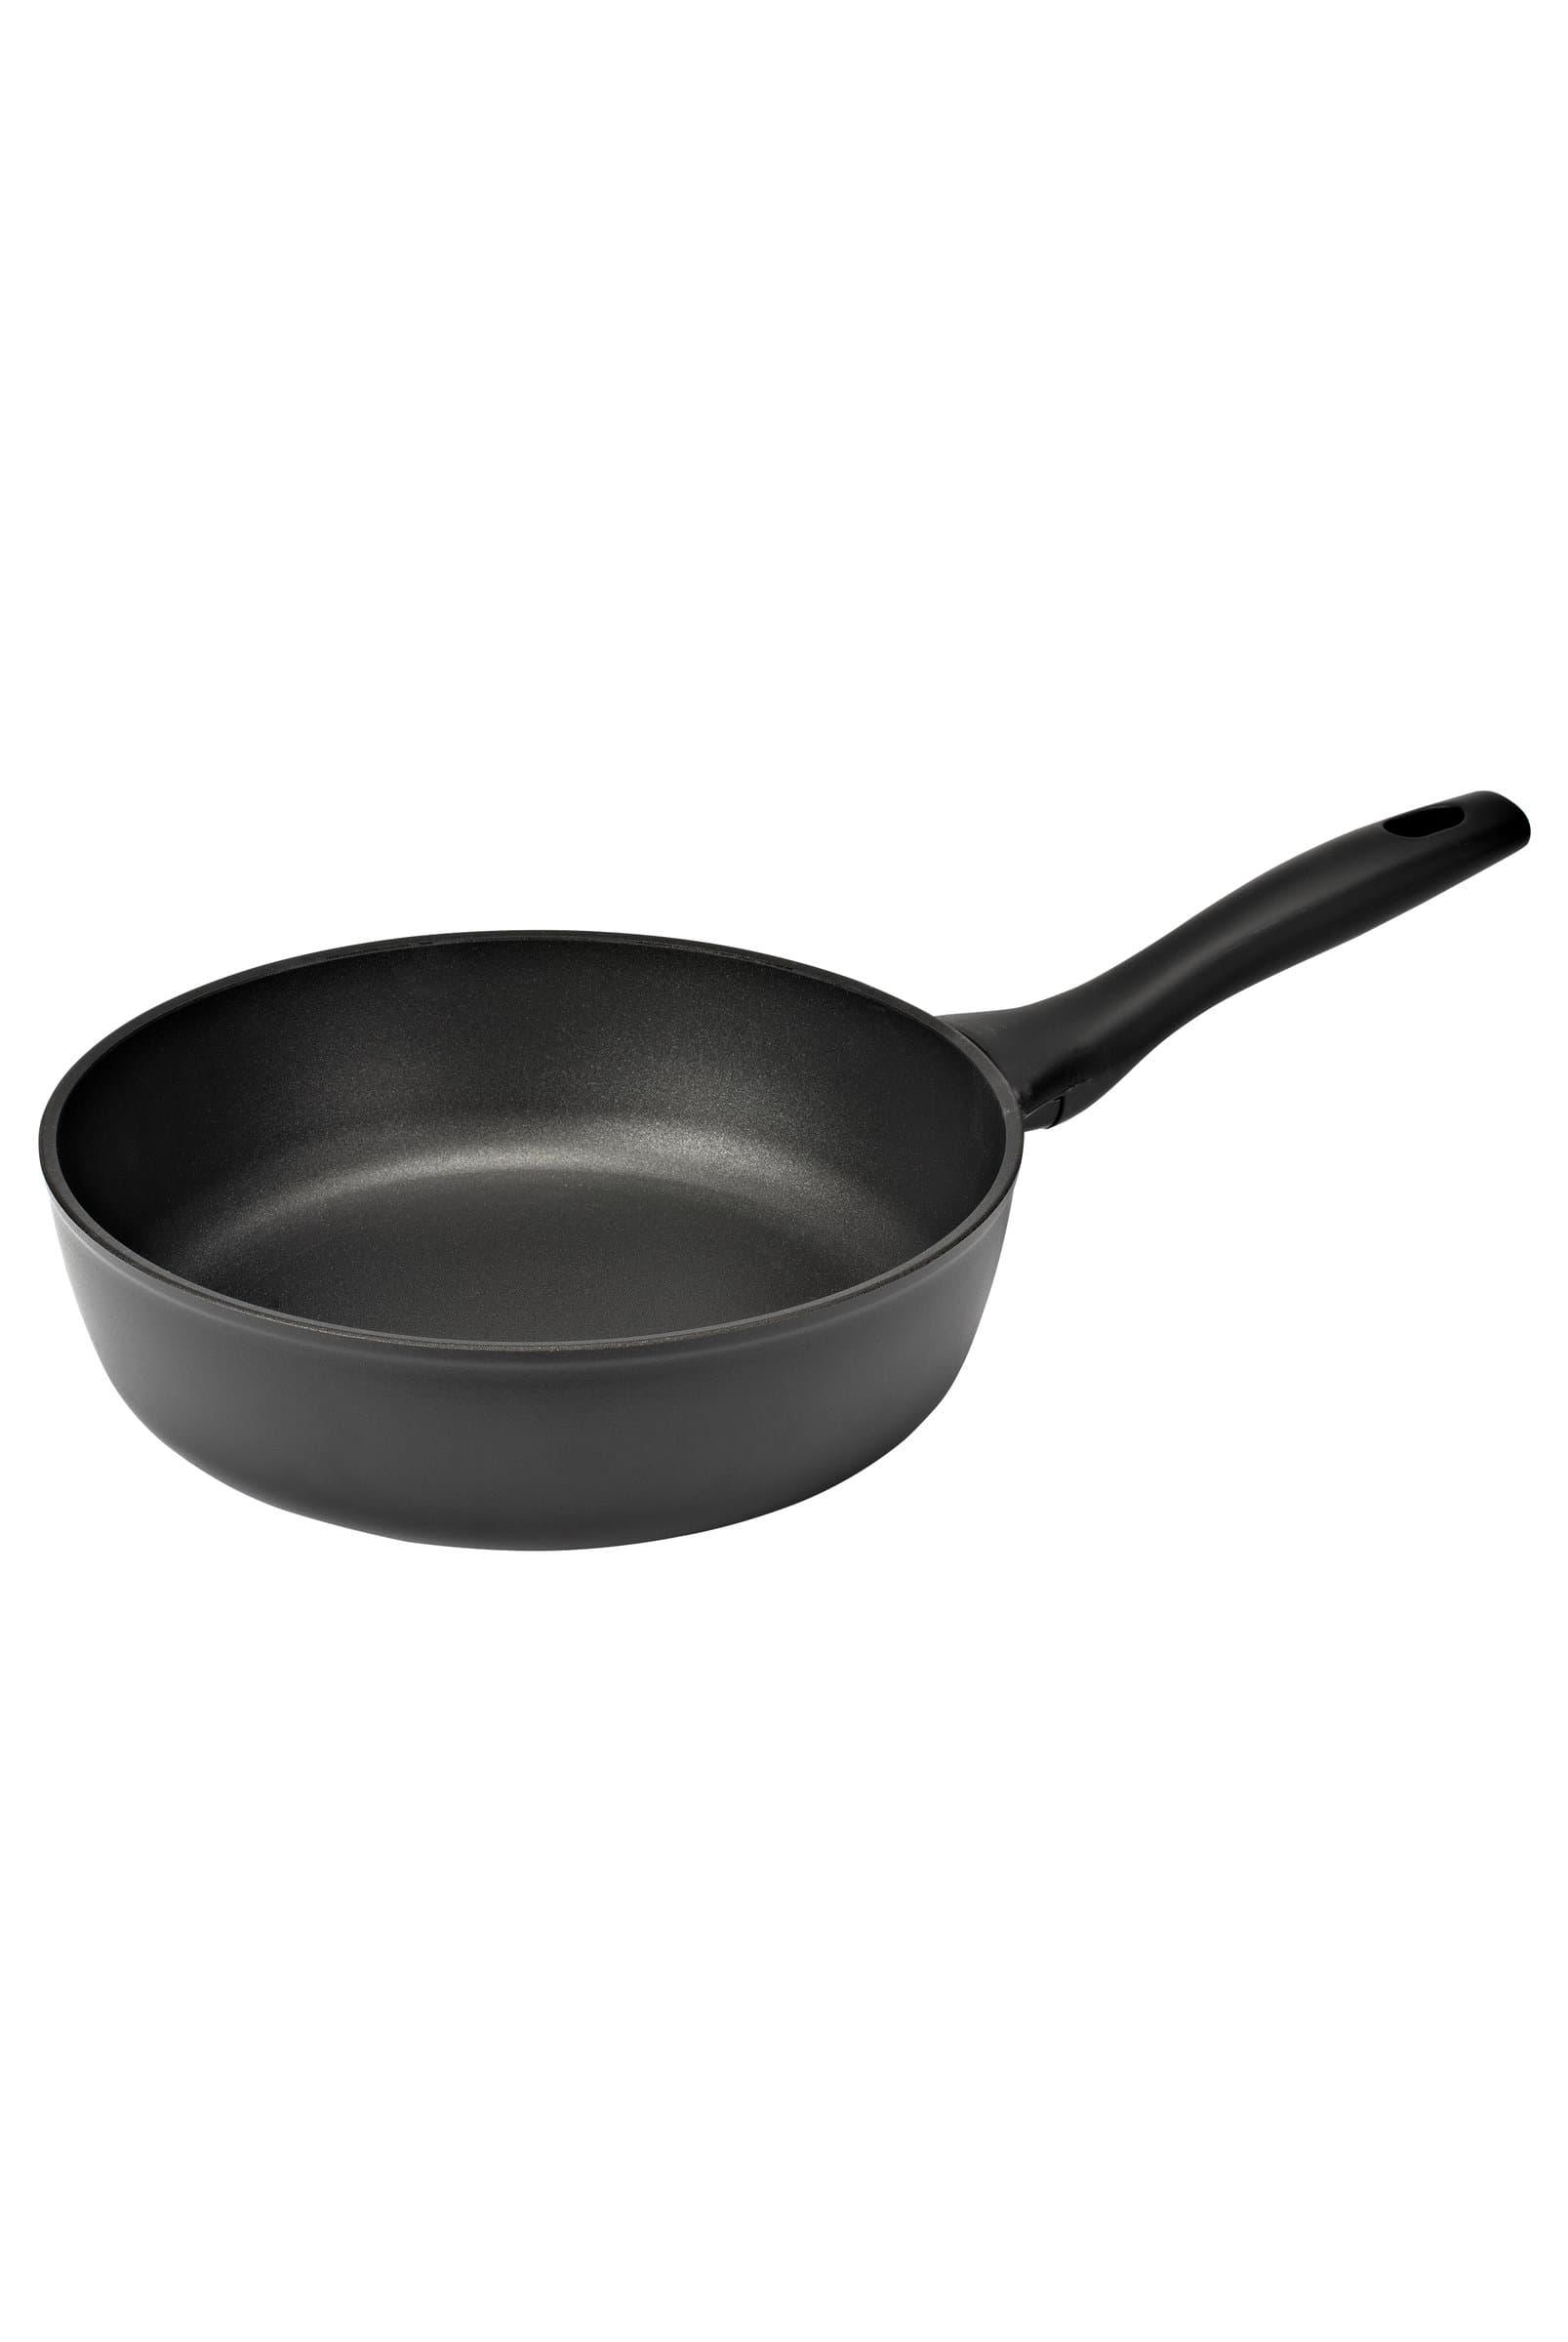 Cucina & Tavola Bratpfanne 24cm high